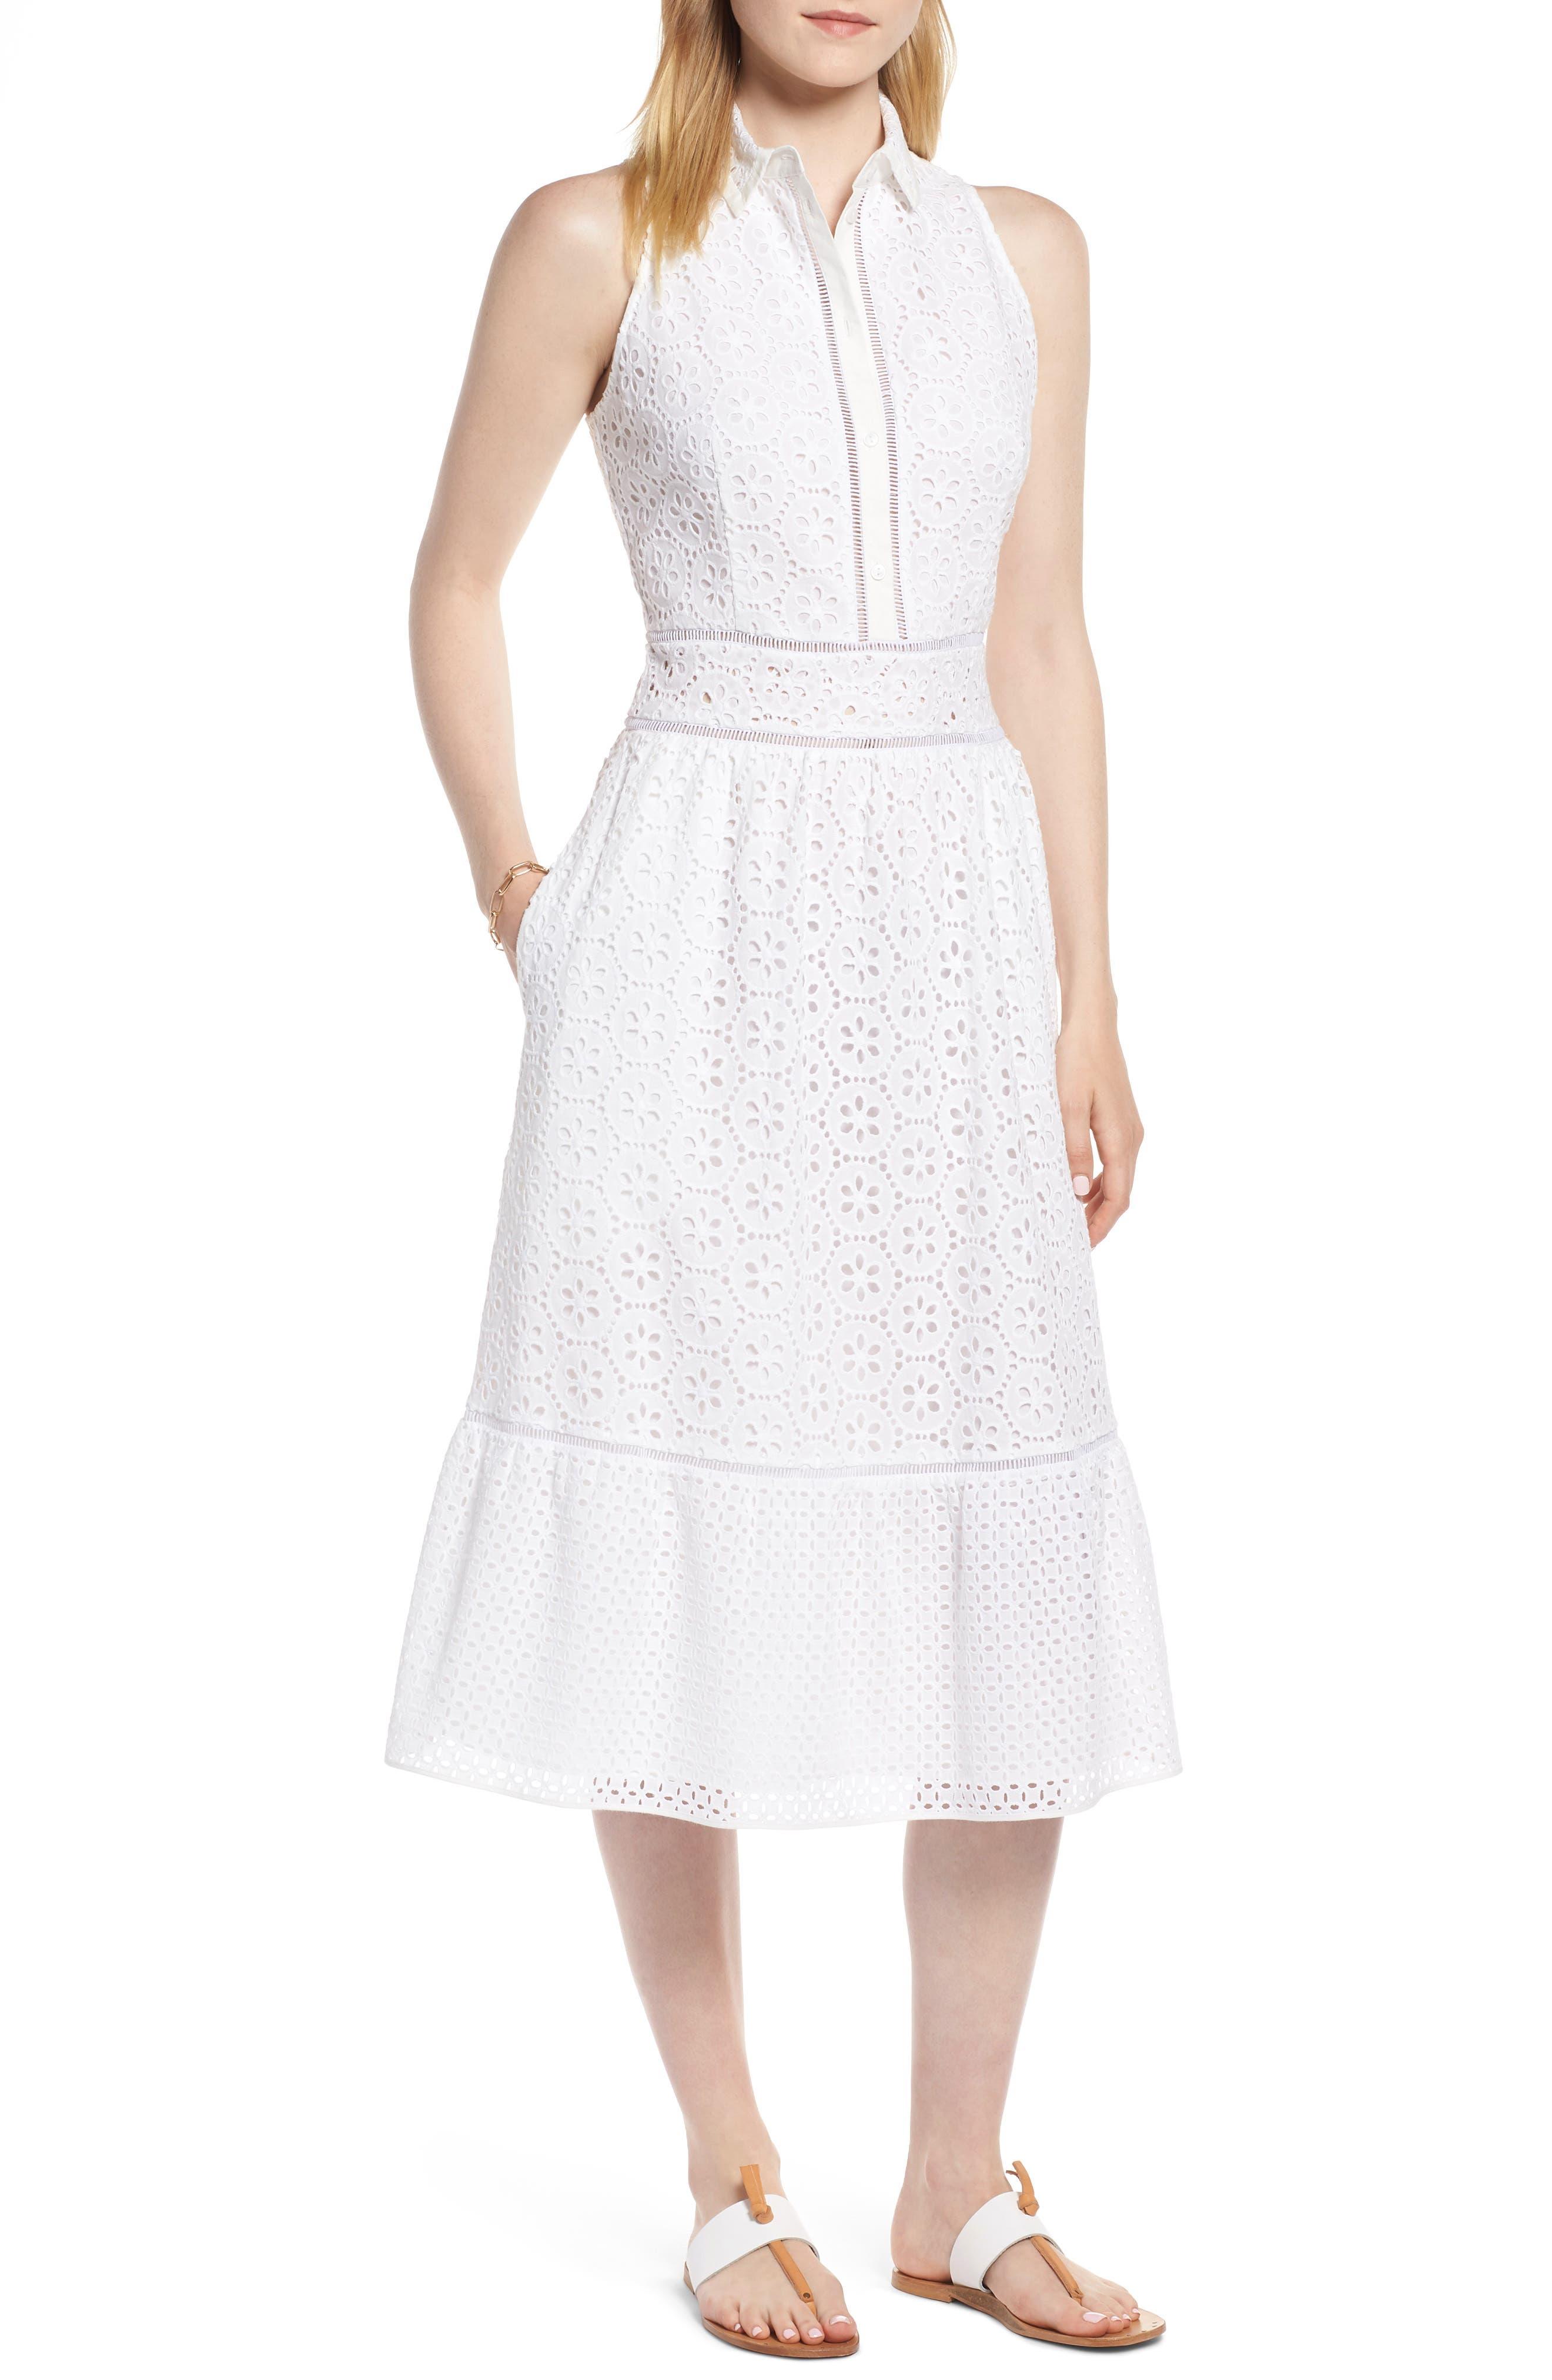 Cotton Eyelet Sleeveless Shirtdress,                             Main thumbnail 1, color,                             White